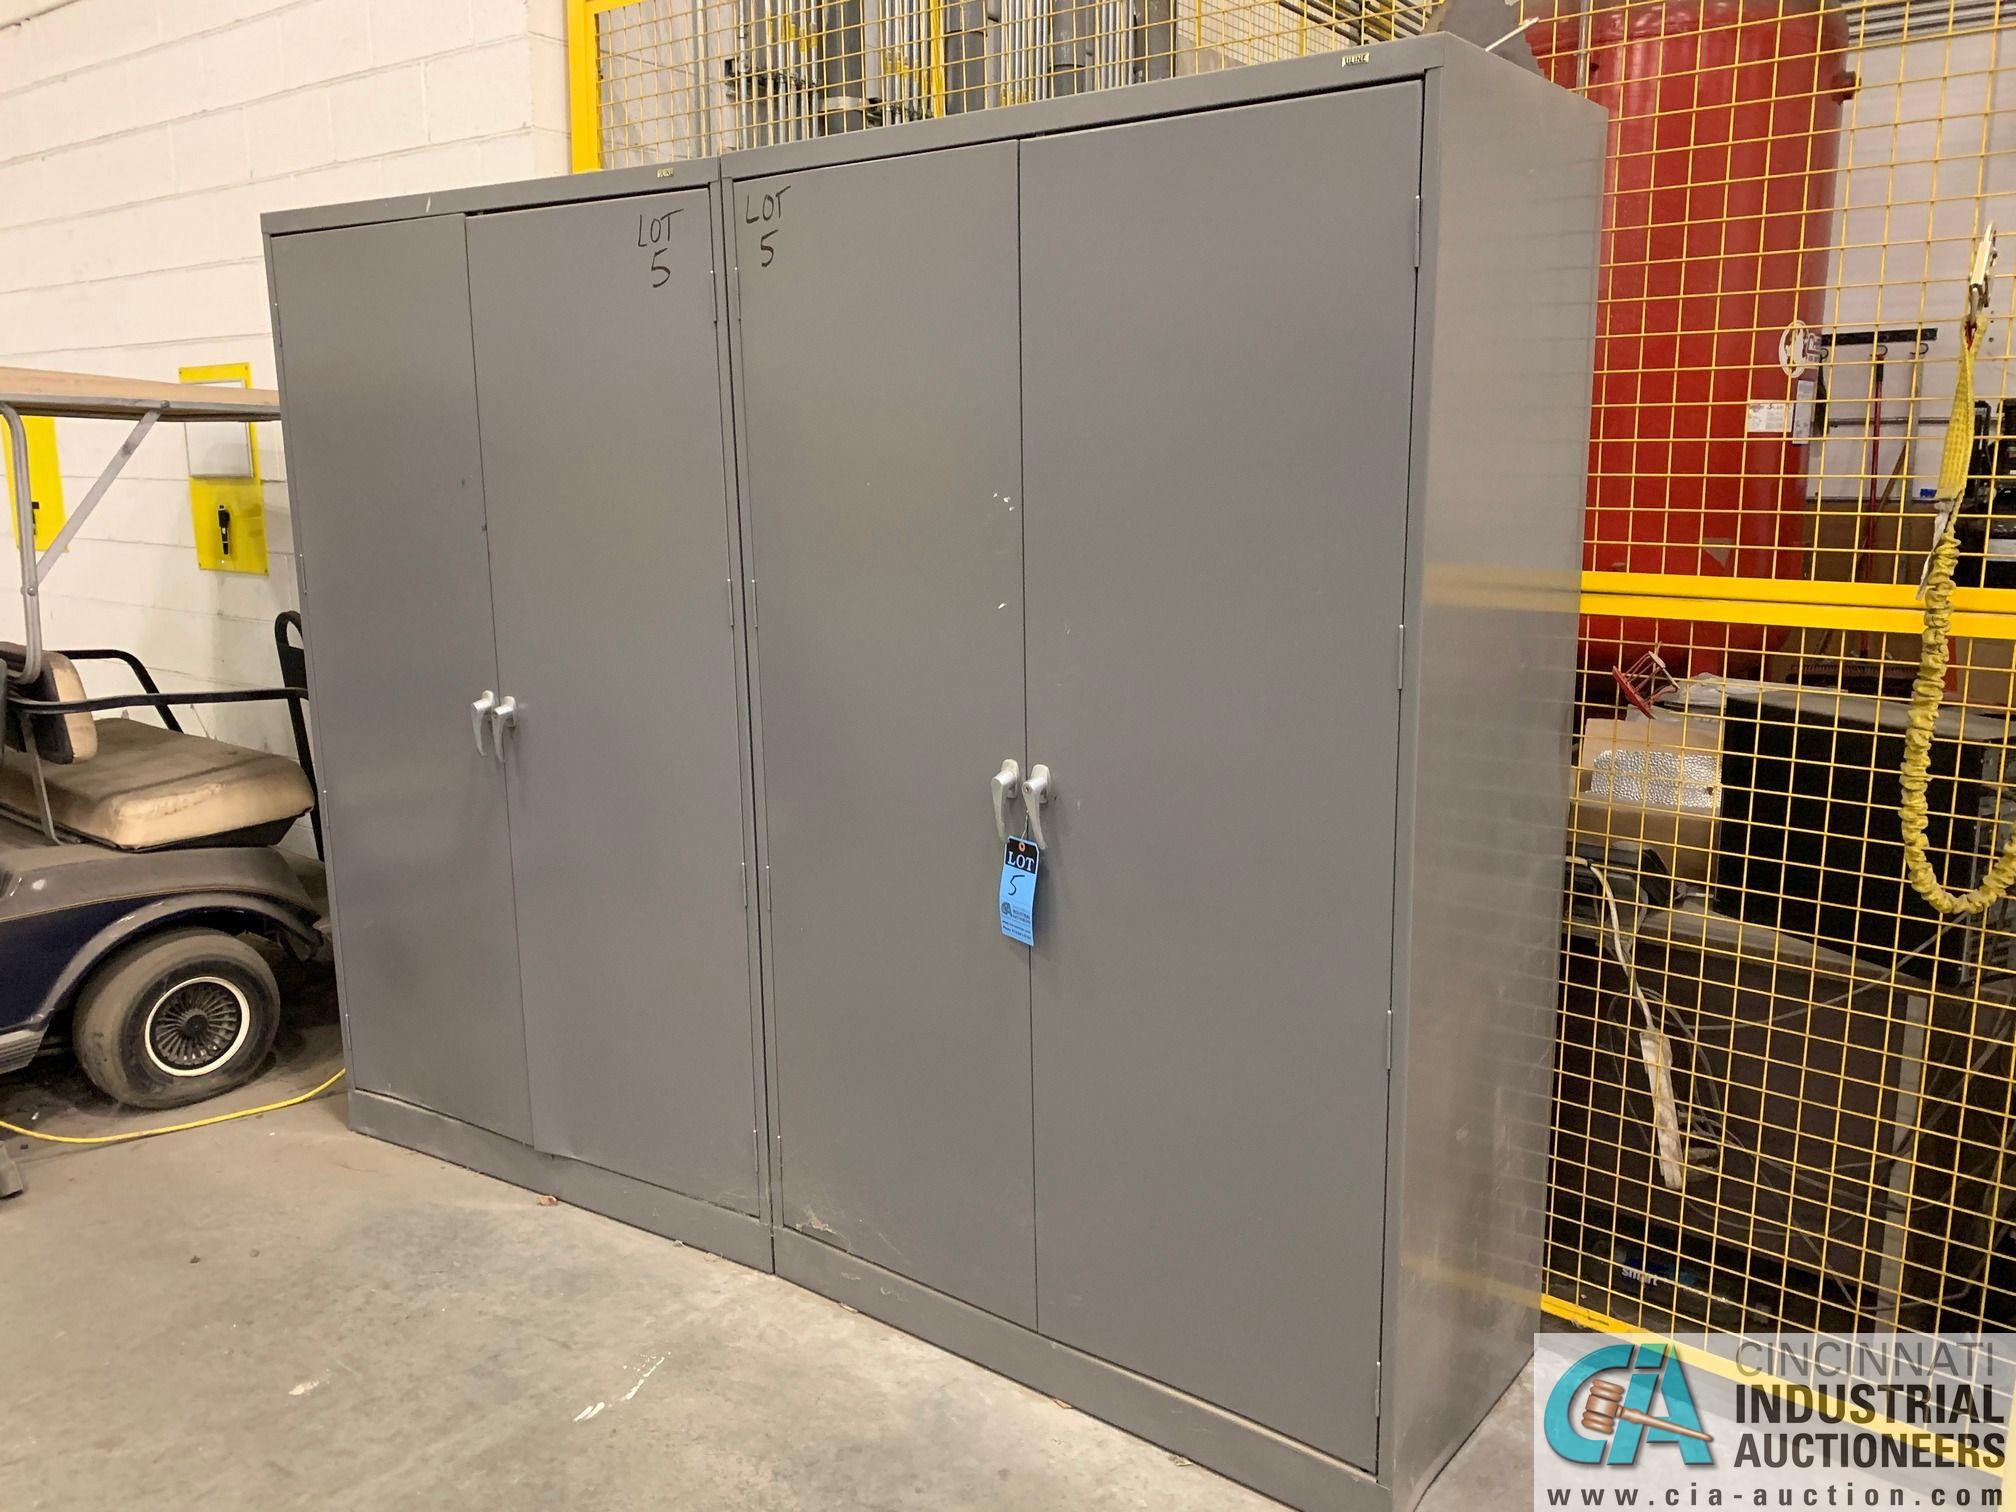 GRAY TWO-DOOR STORAGE CABINETS (5400 OAKLEY INDUSTRIAL BLVD., FAIRBURN, GA 30213)